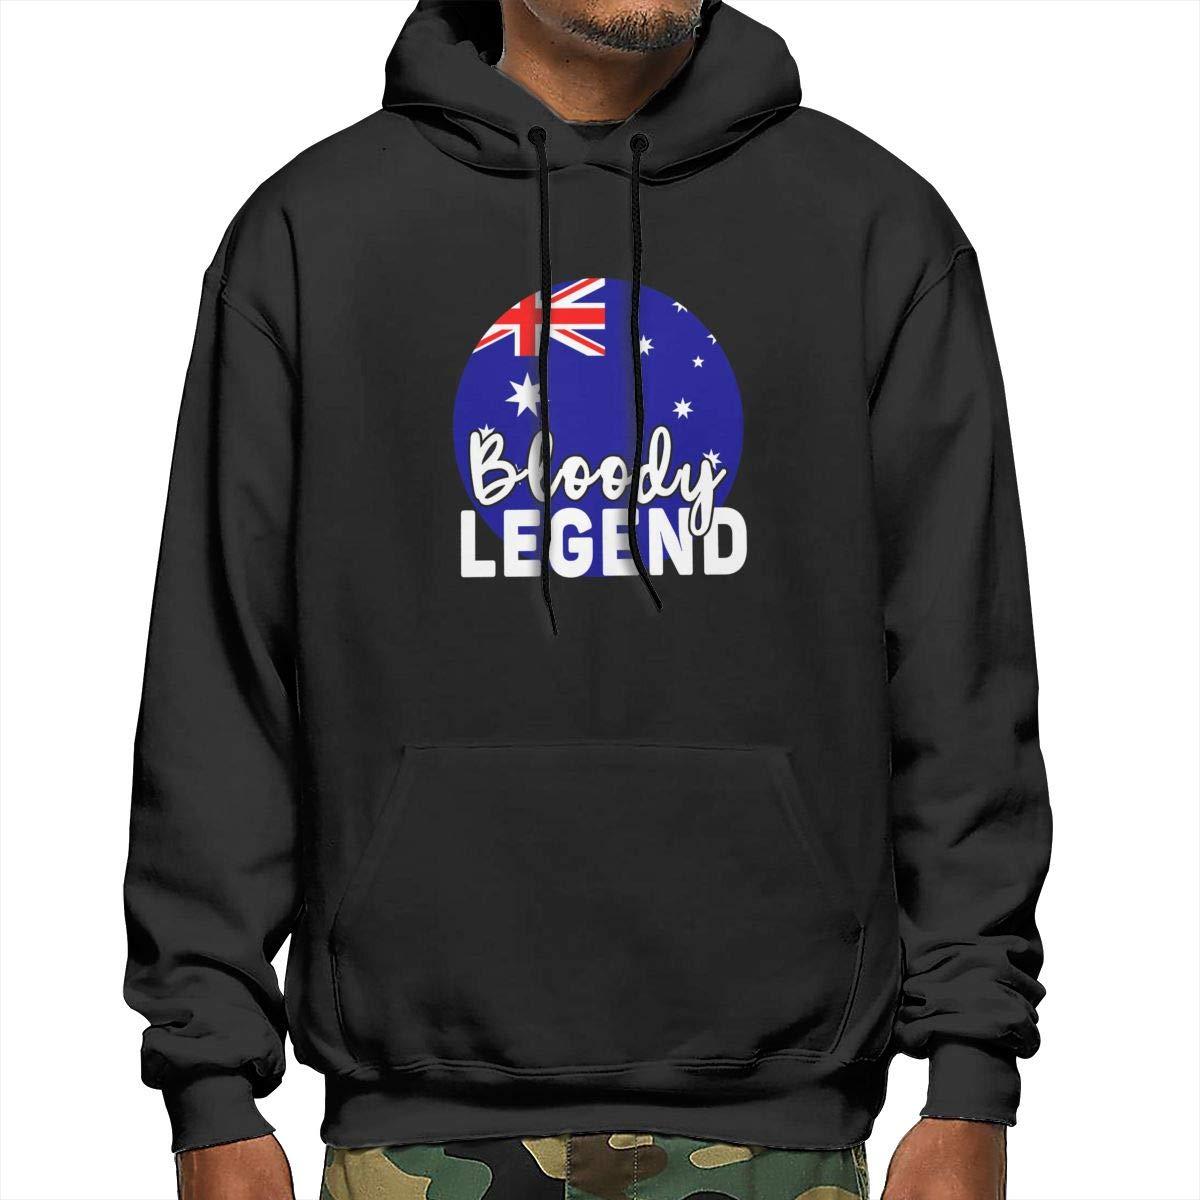 Joyracka Fashion Lazar Beam Youtube Top Sweater 5048 Shirts